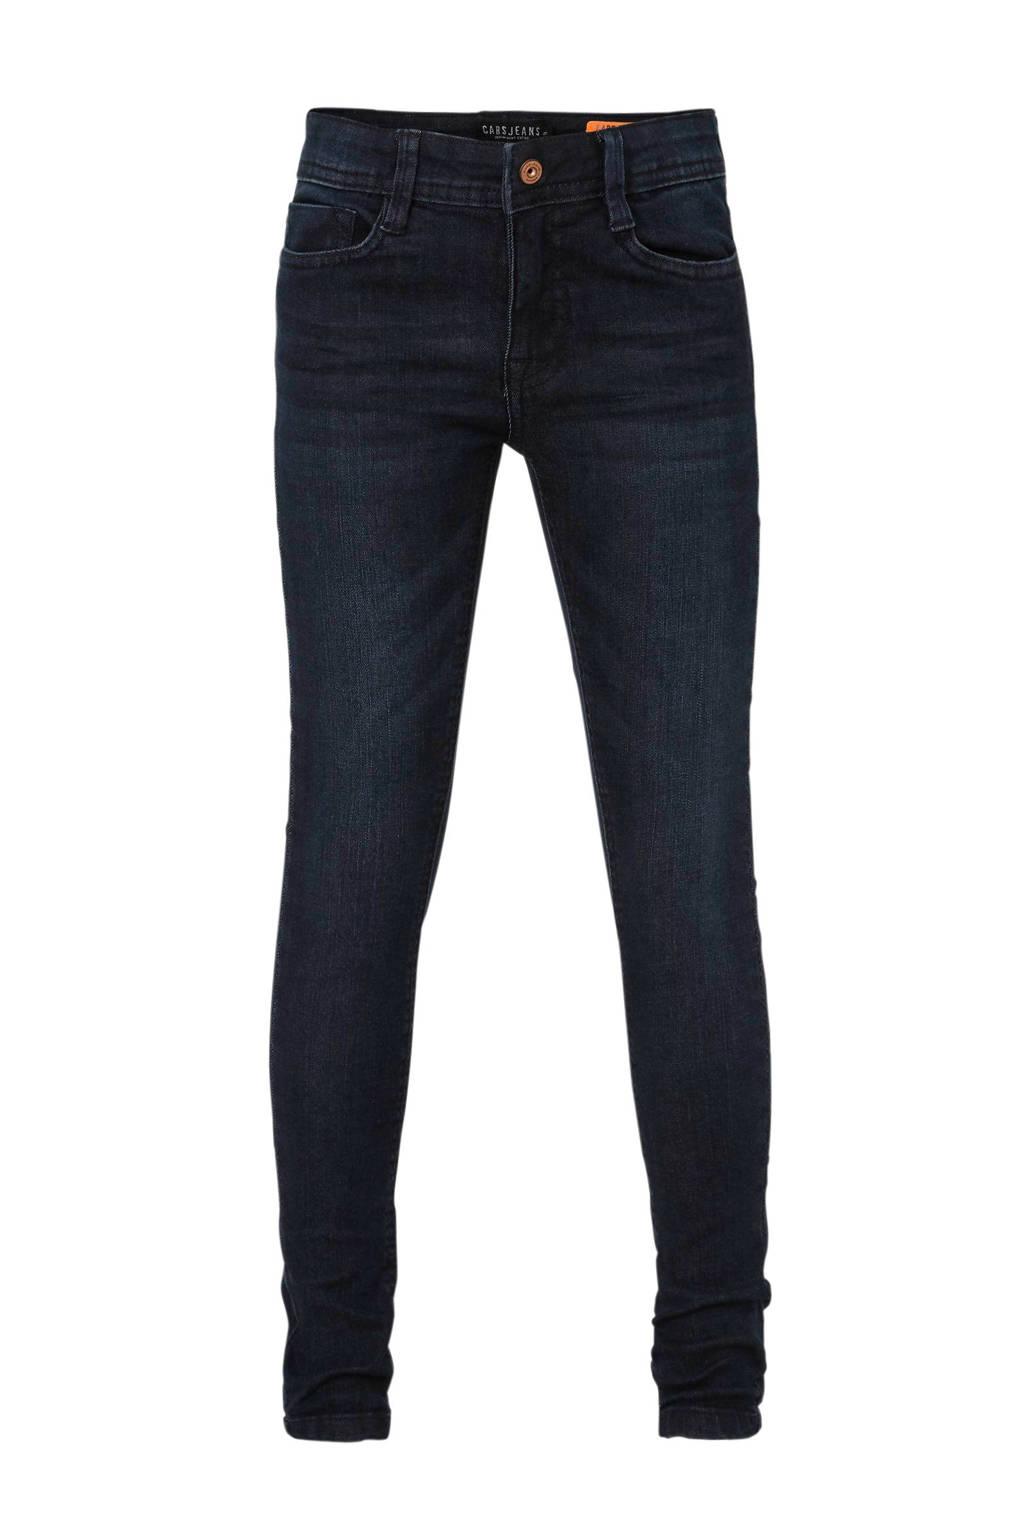 Cars skinny jeans Davis blue black, Blue black